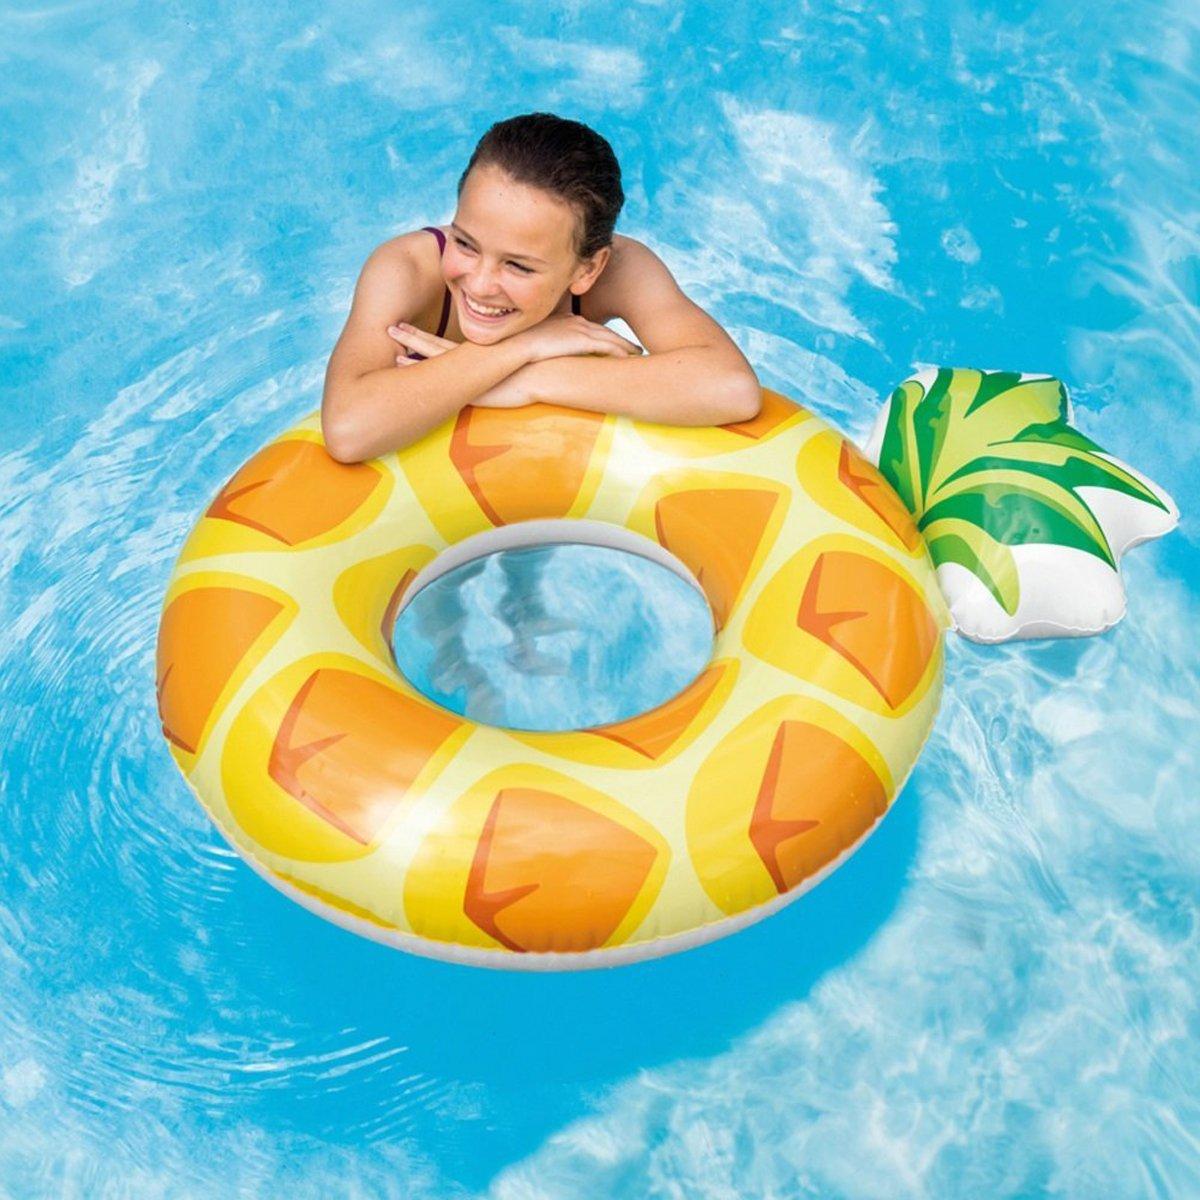 Dabuty Online, S.L. Flotador Piña Hinchable Diseño Amarillo Adulto Medidas 117x86 cm. Flotador Fruta para Playa o Piscina.: Amazon.es: Hogar